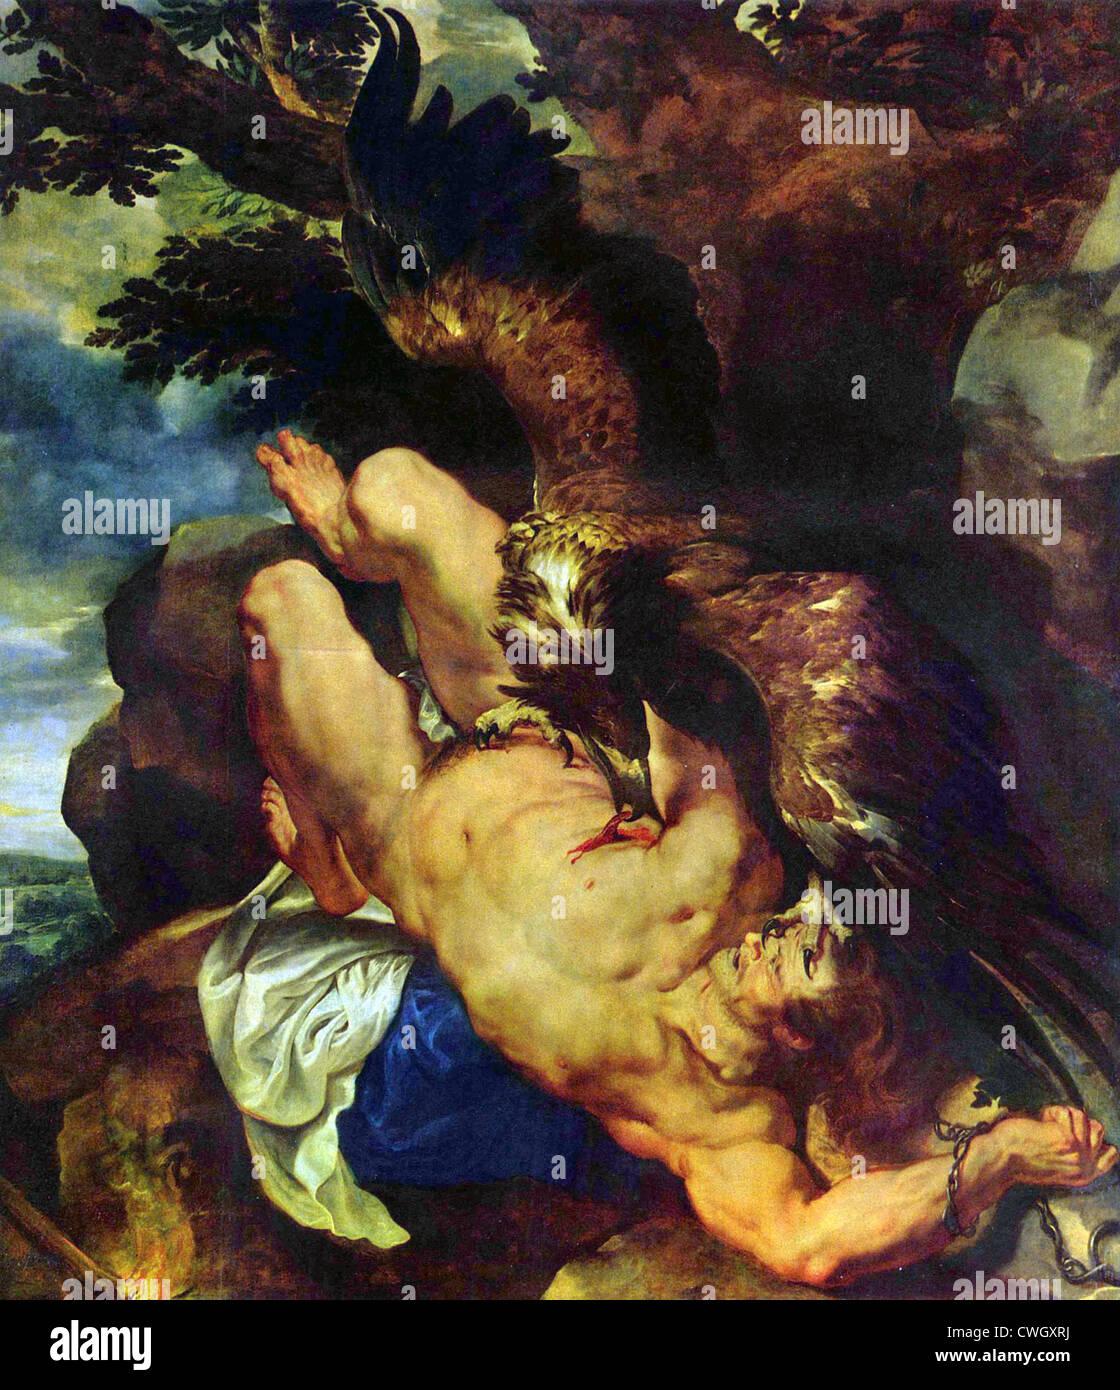 Prometheus Bound by Peter Paul Rubens - Stock Image